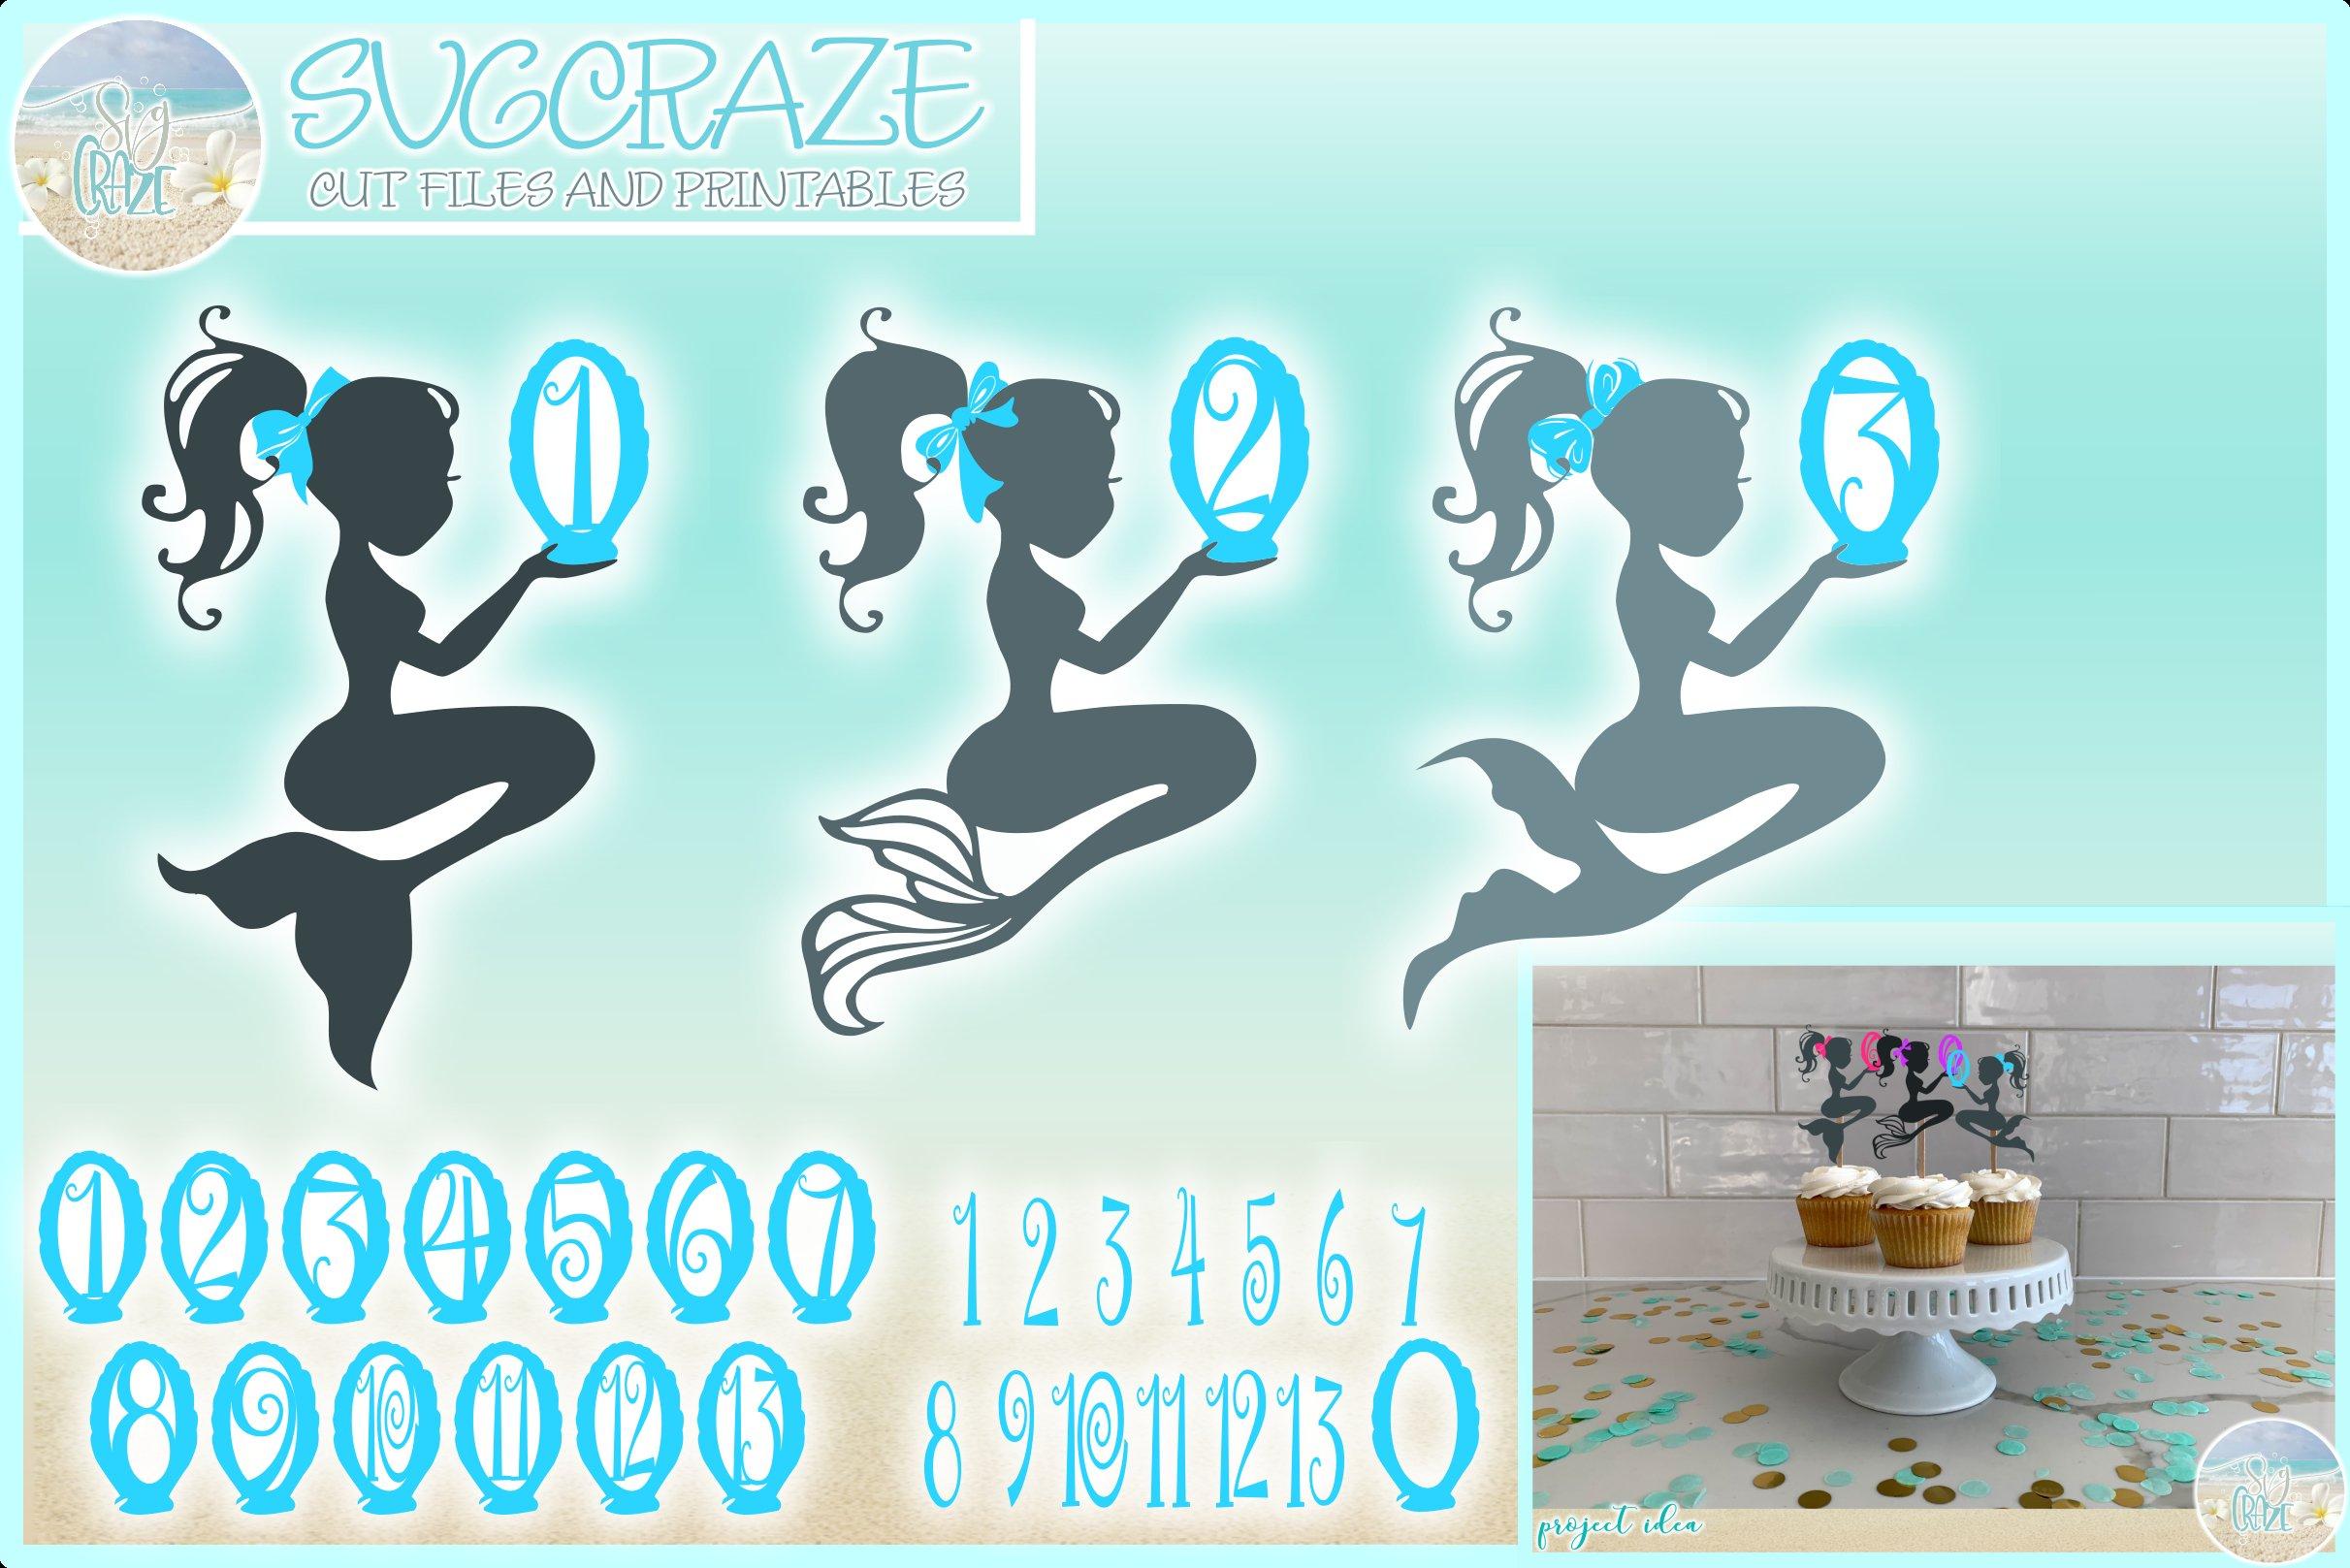 Mermaid Birthday Decoration Cake Topper Svg 261285 Svgs Design Bundles